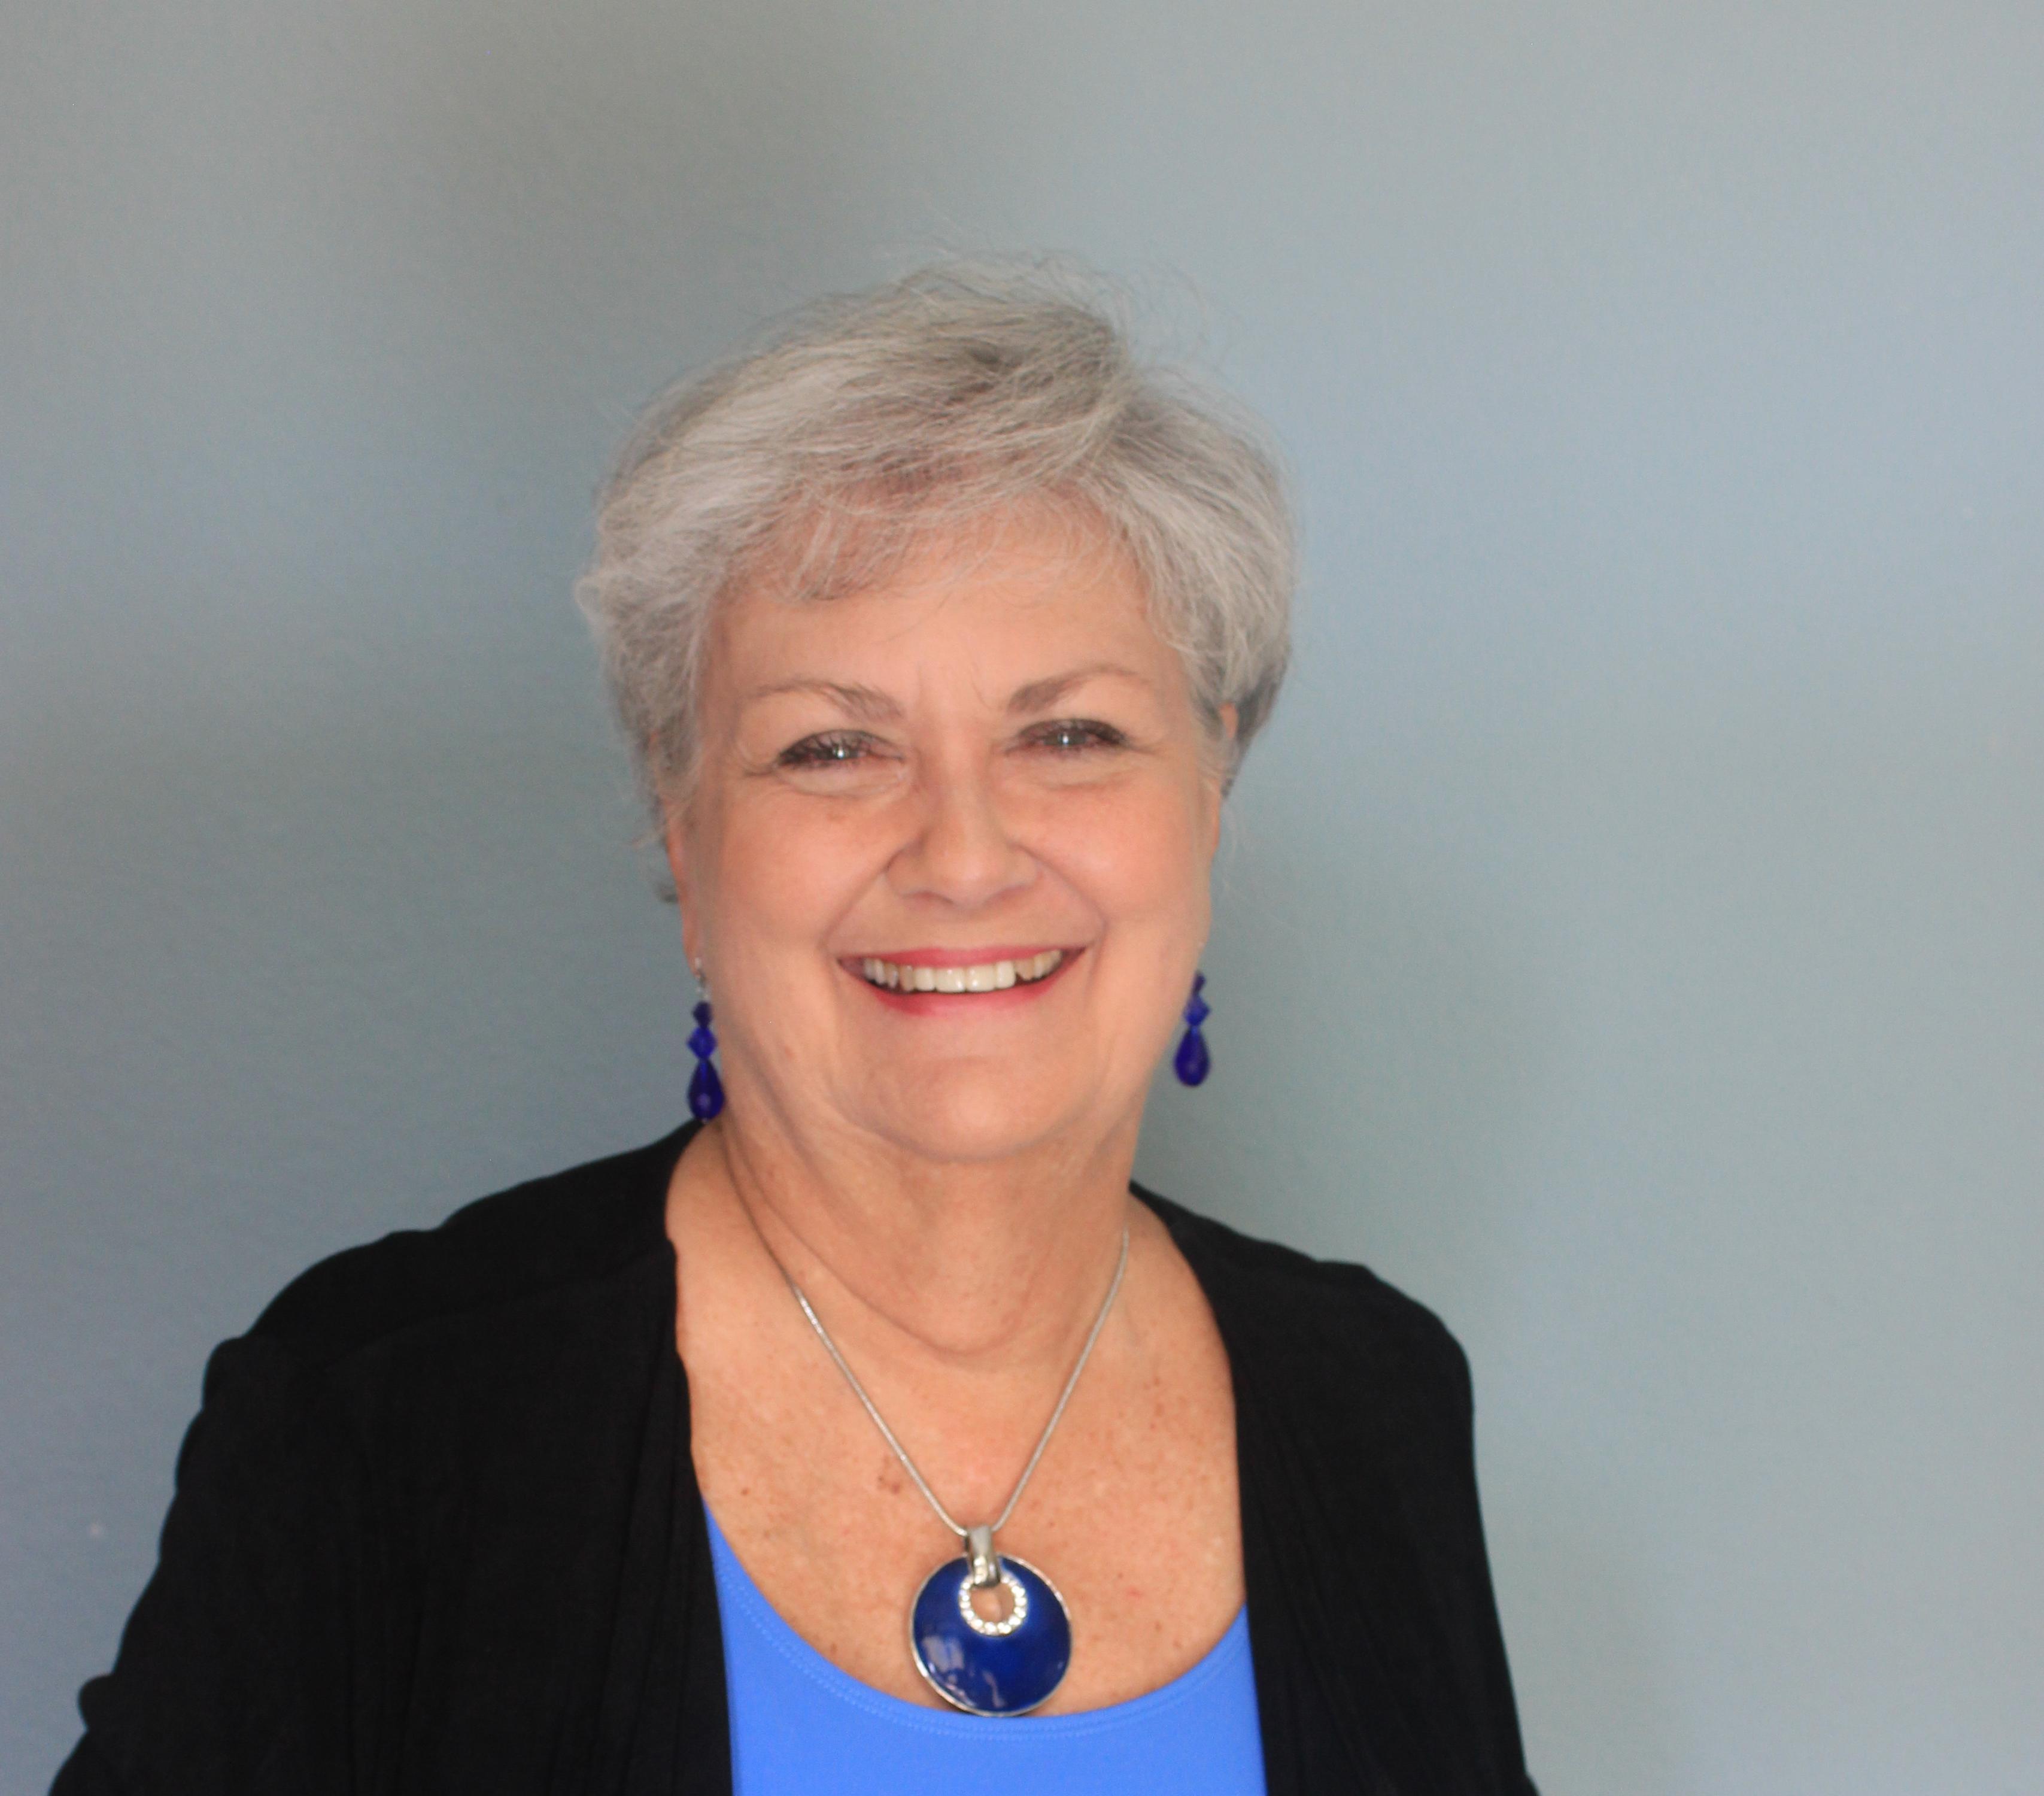 Ann Sconyers